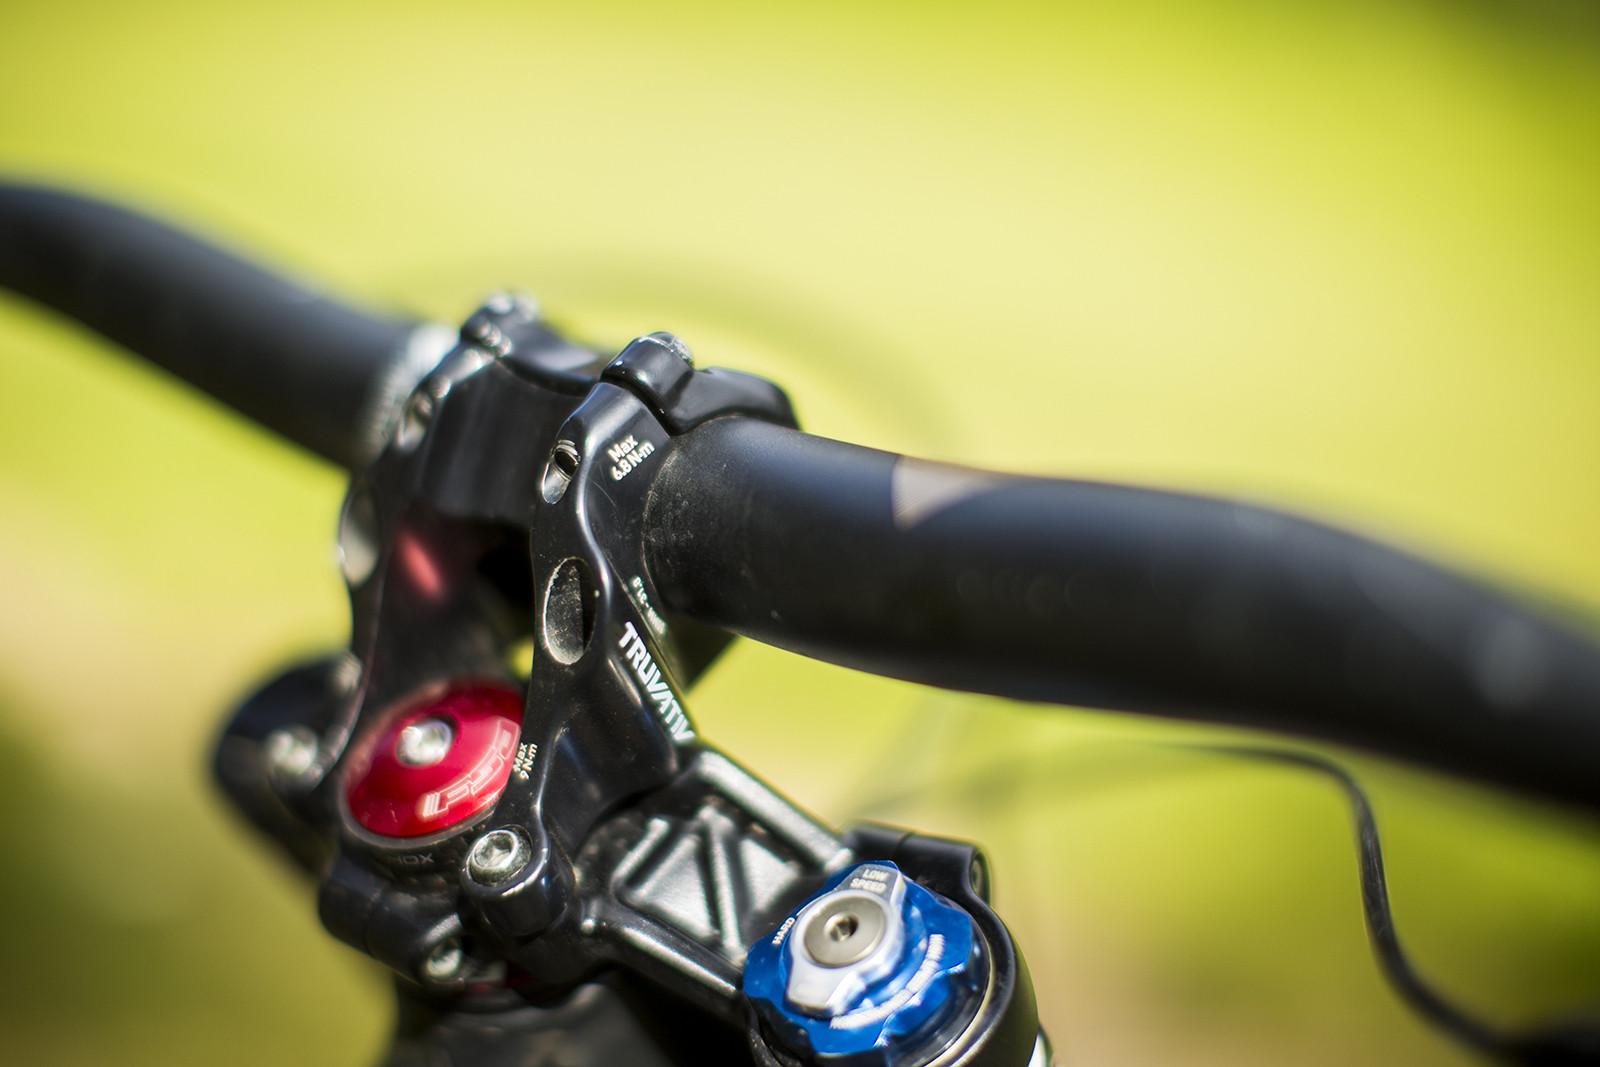 Winning Bike: Andrew Crimmins' Kona Supreme Operator - Winning Bike: Andrew Crimmins' Kona Supreme Operator - Mountain Biking Pictures - Vital MTB